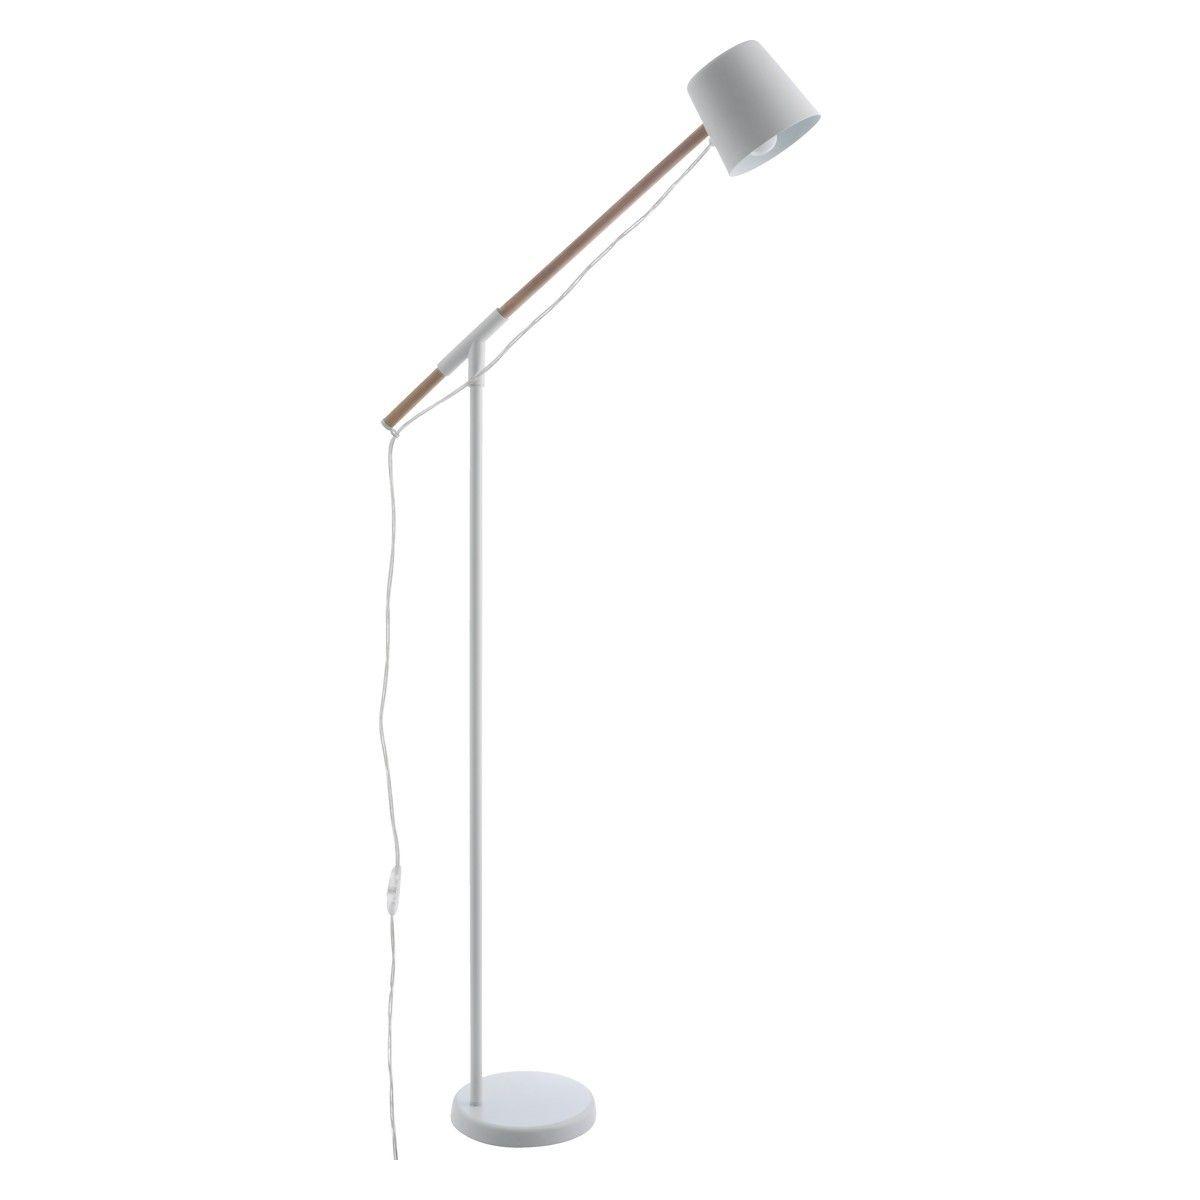 PEETA White metal and wood floor lamp | Floor lamp, Metals and Woods